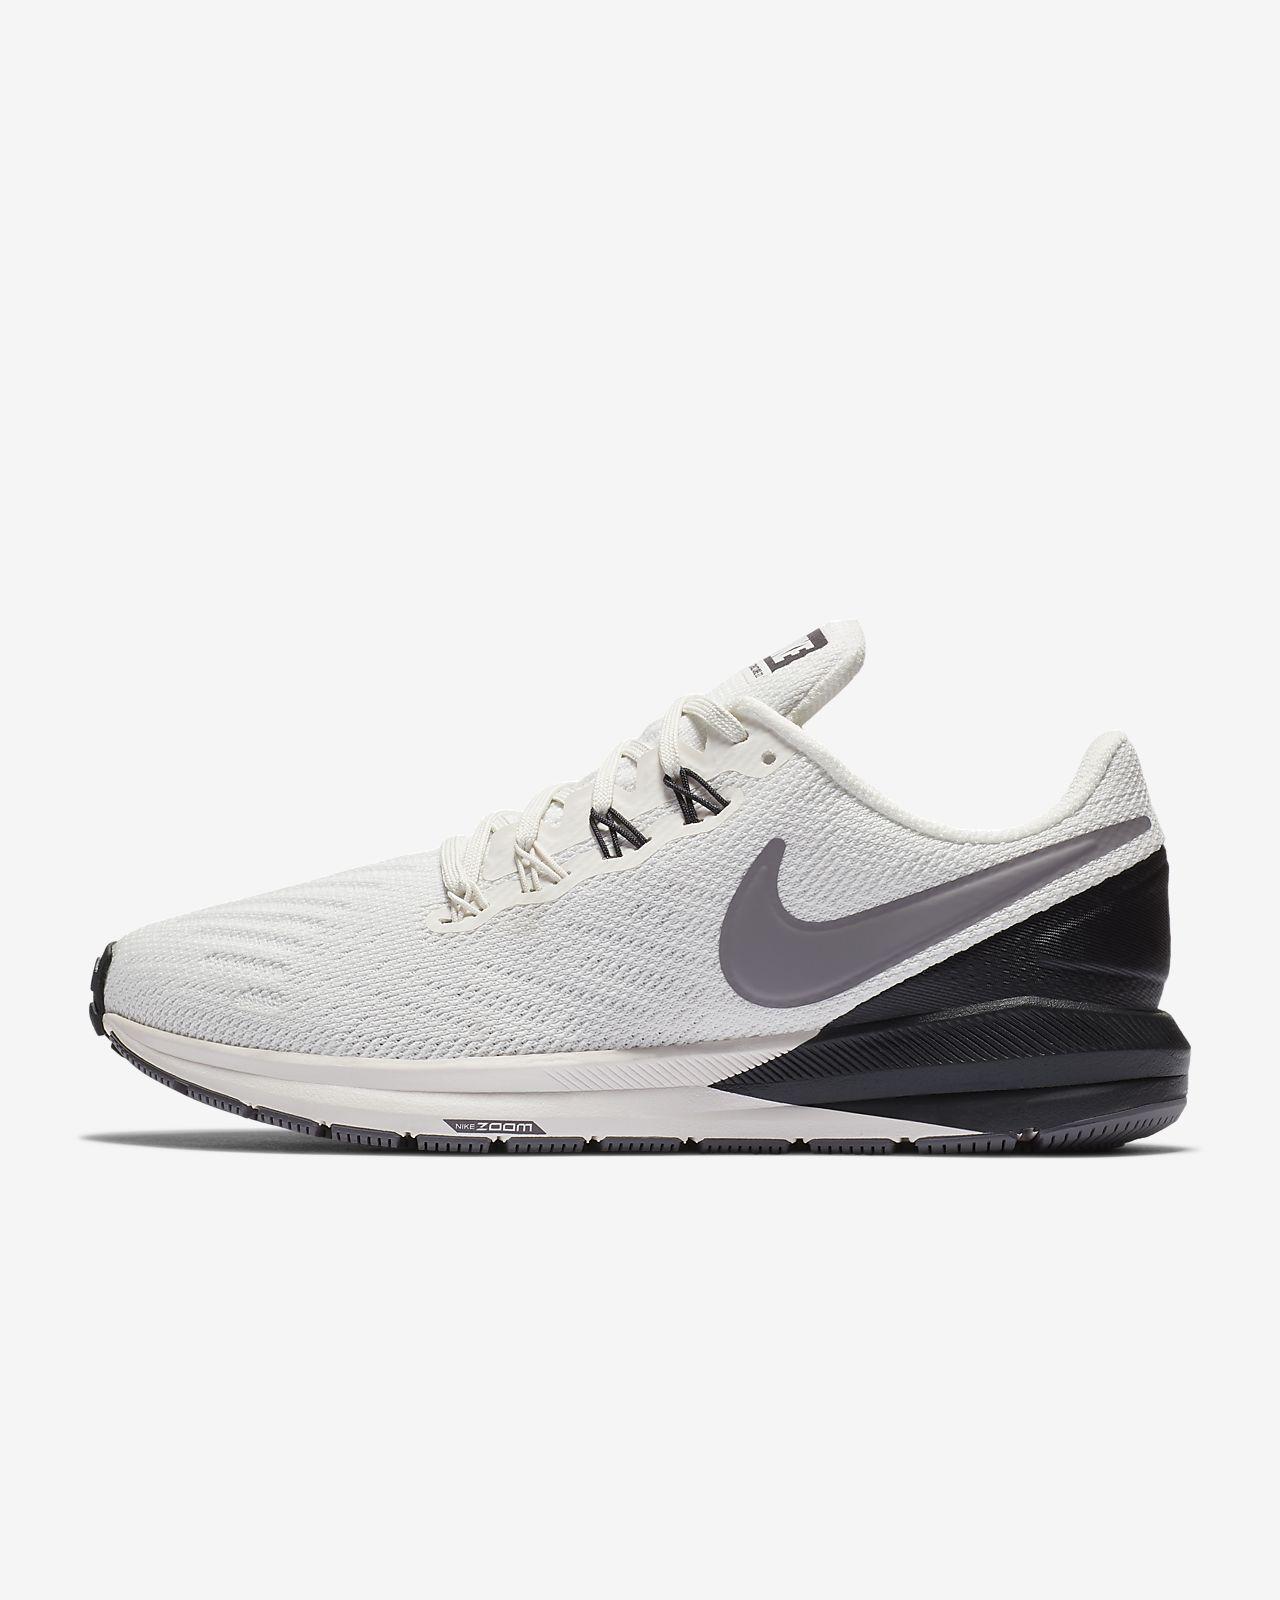 35d87a0c1a8 Nike Structure 22 Fr Zoom Chaussure Running De Air Pour Femme wAqSxZa